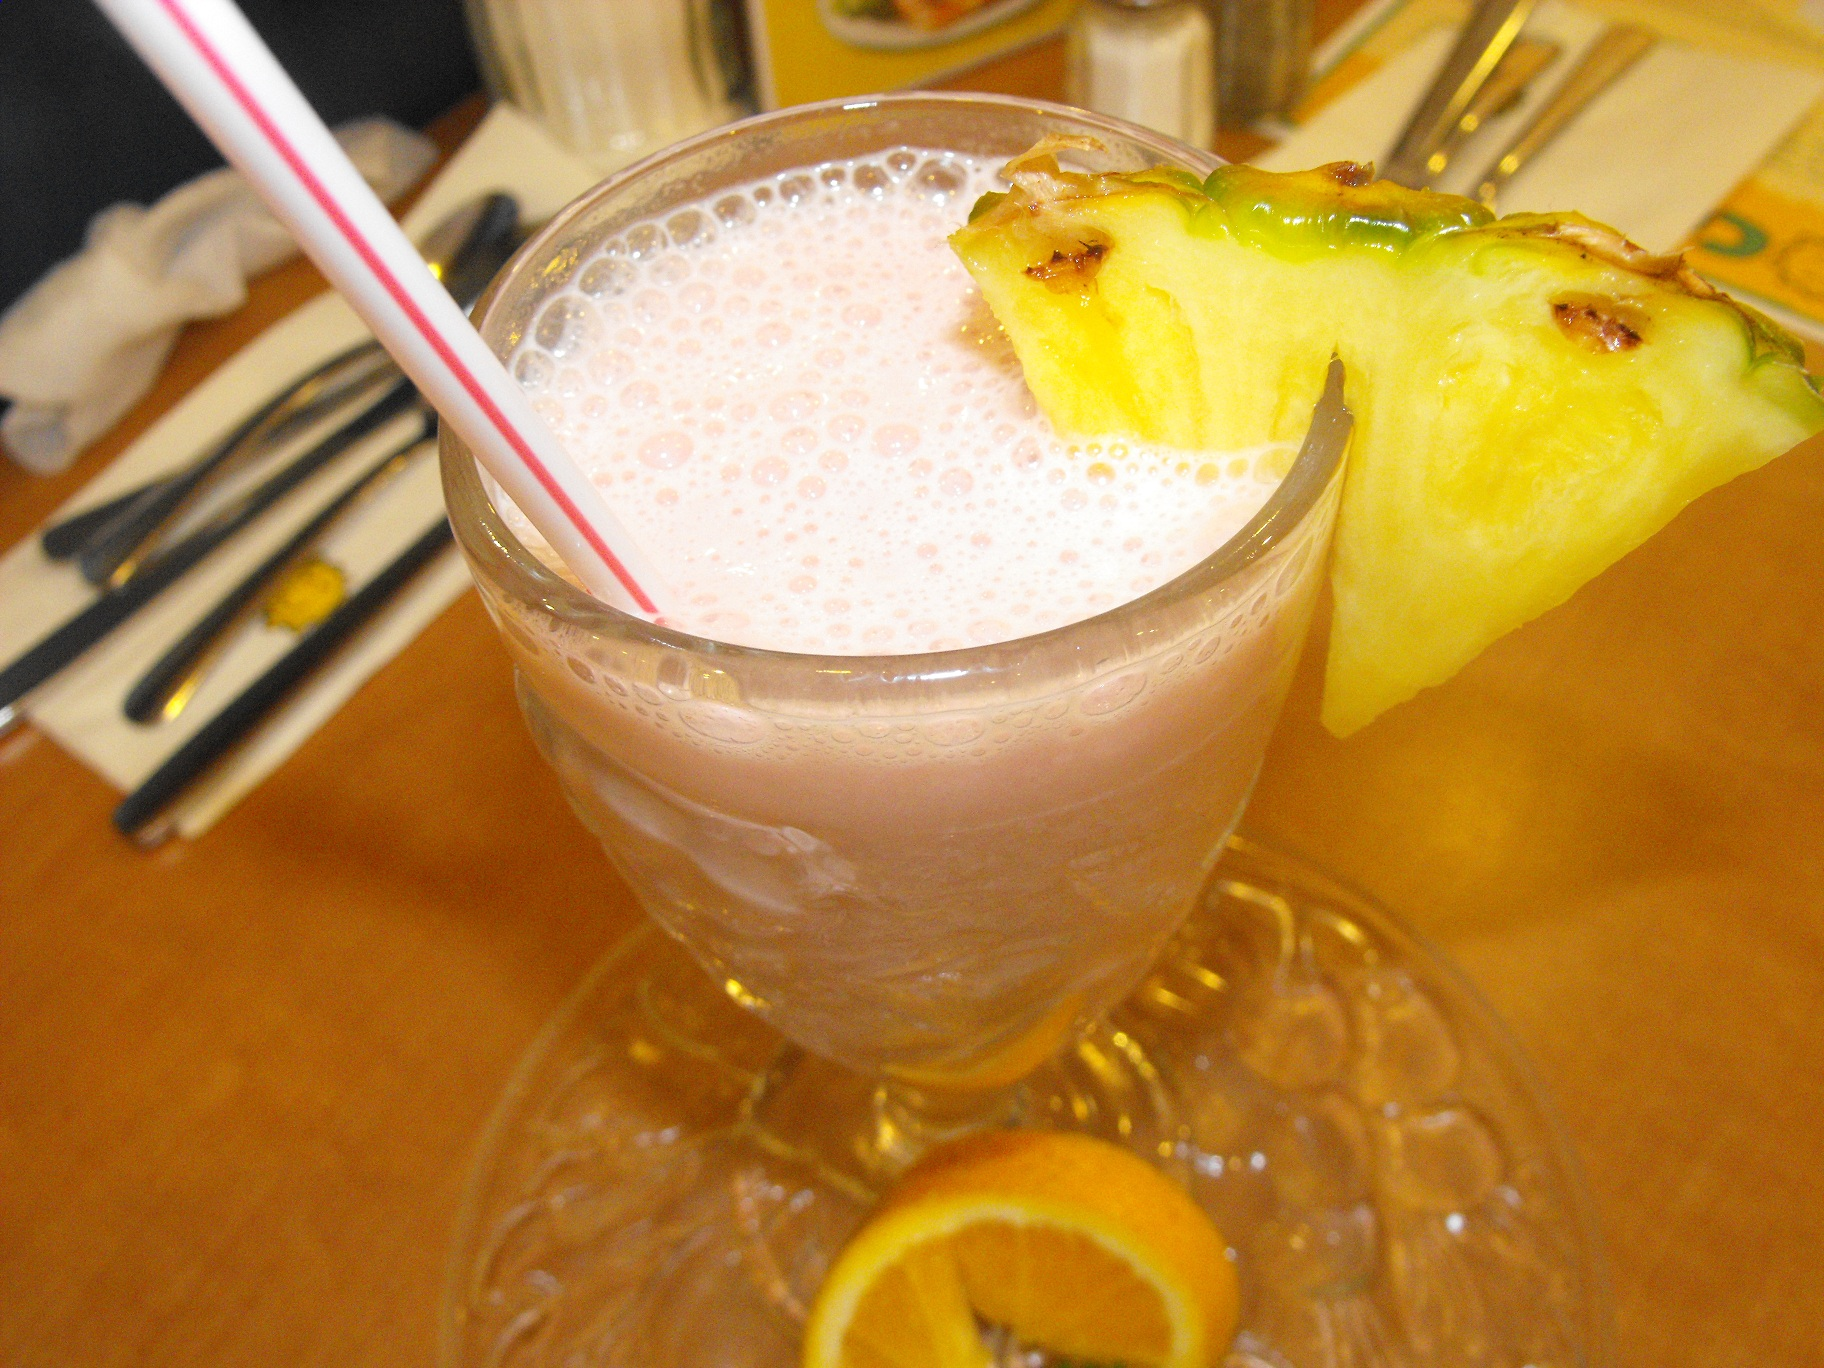 https://foodloader.net/cutie_2011-03-17_Strawberry-Banana_Smoothie.jpg